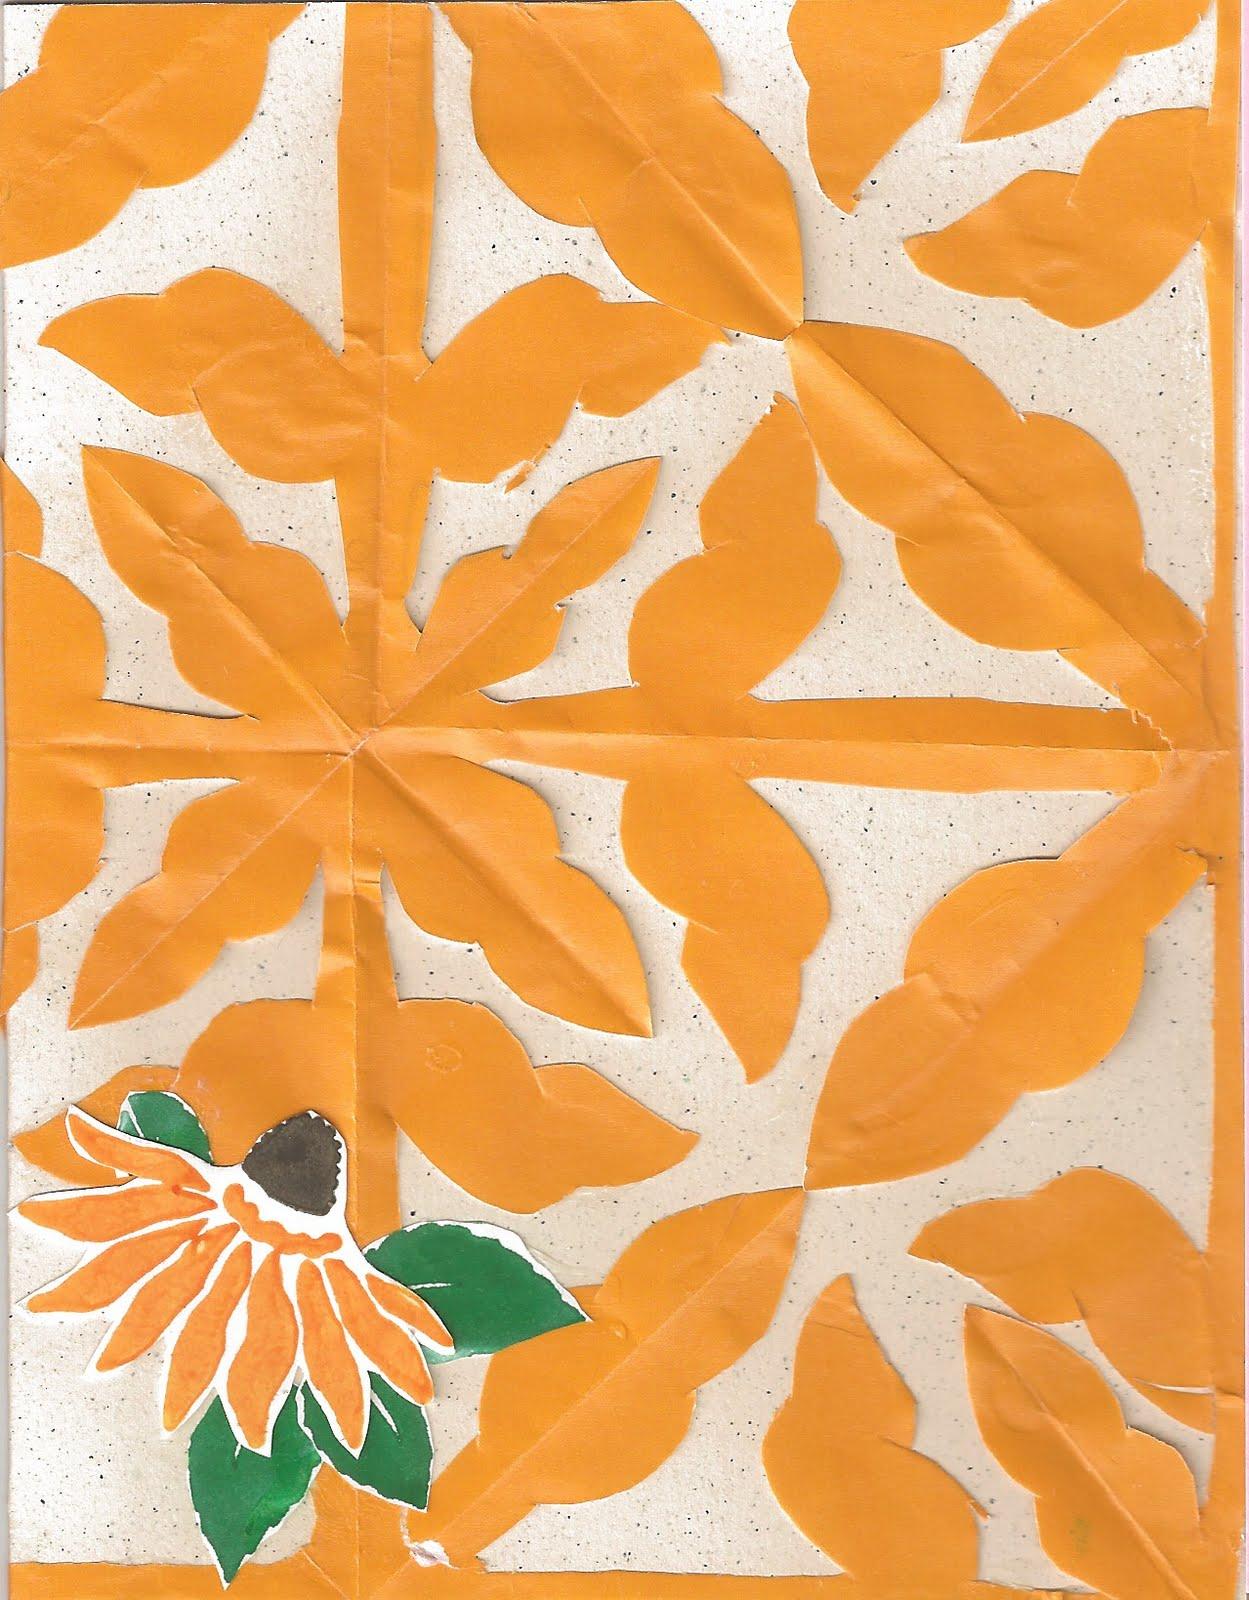 http://2.bp.blogspot.com/-FGGVn3LzoiI/Tk1T2_-o4dI/AAAAAAAAC3I/OOCf98UciJ4/s1600/sun+coneflower+on+large+goldenrod+kiri+leaves.jpg